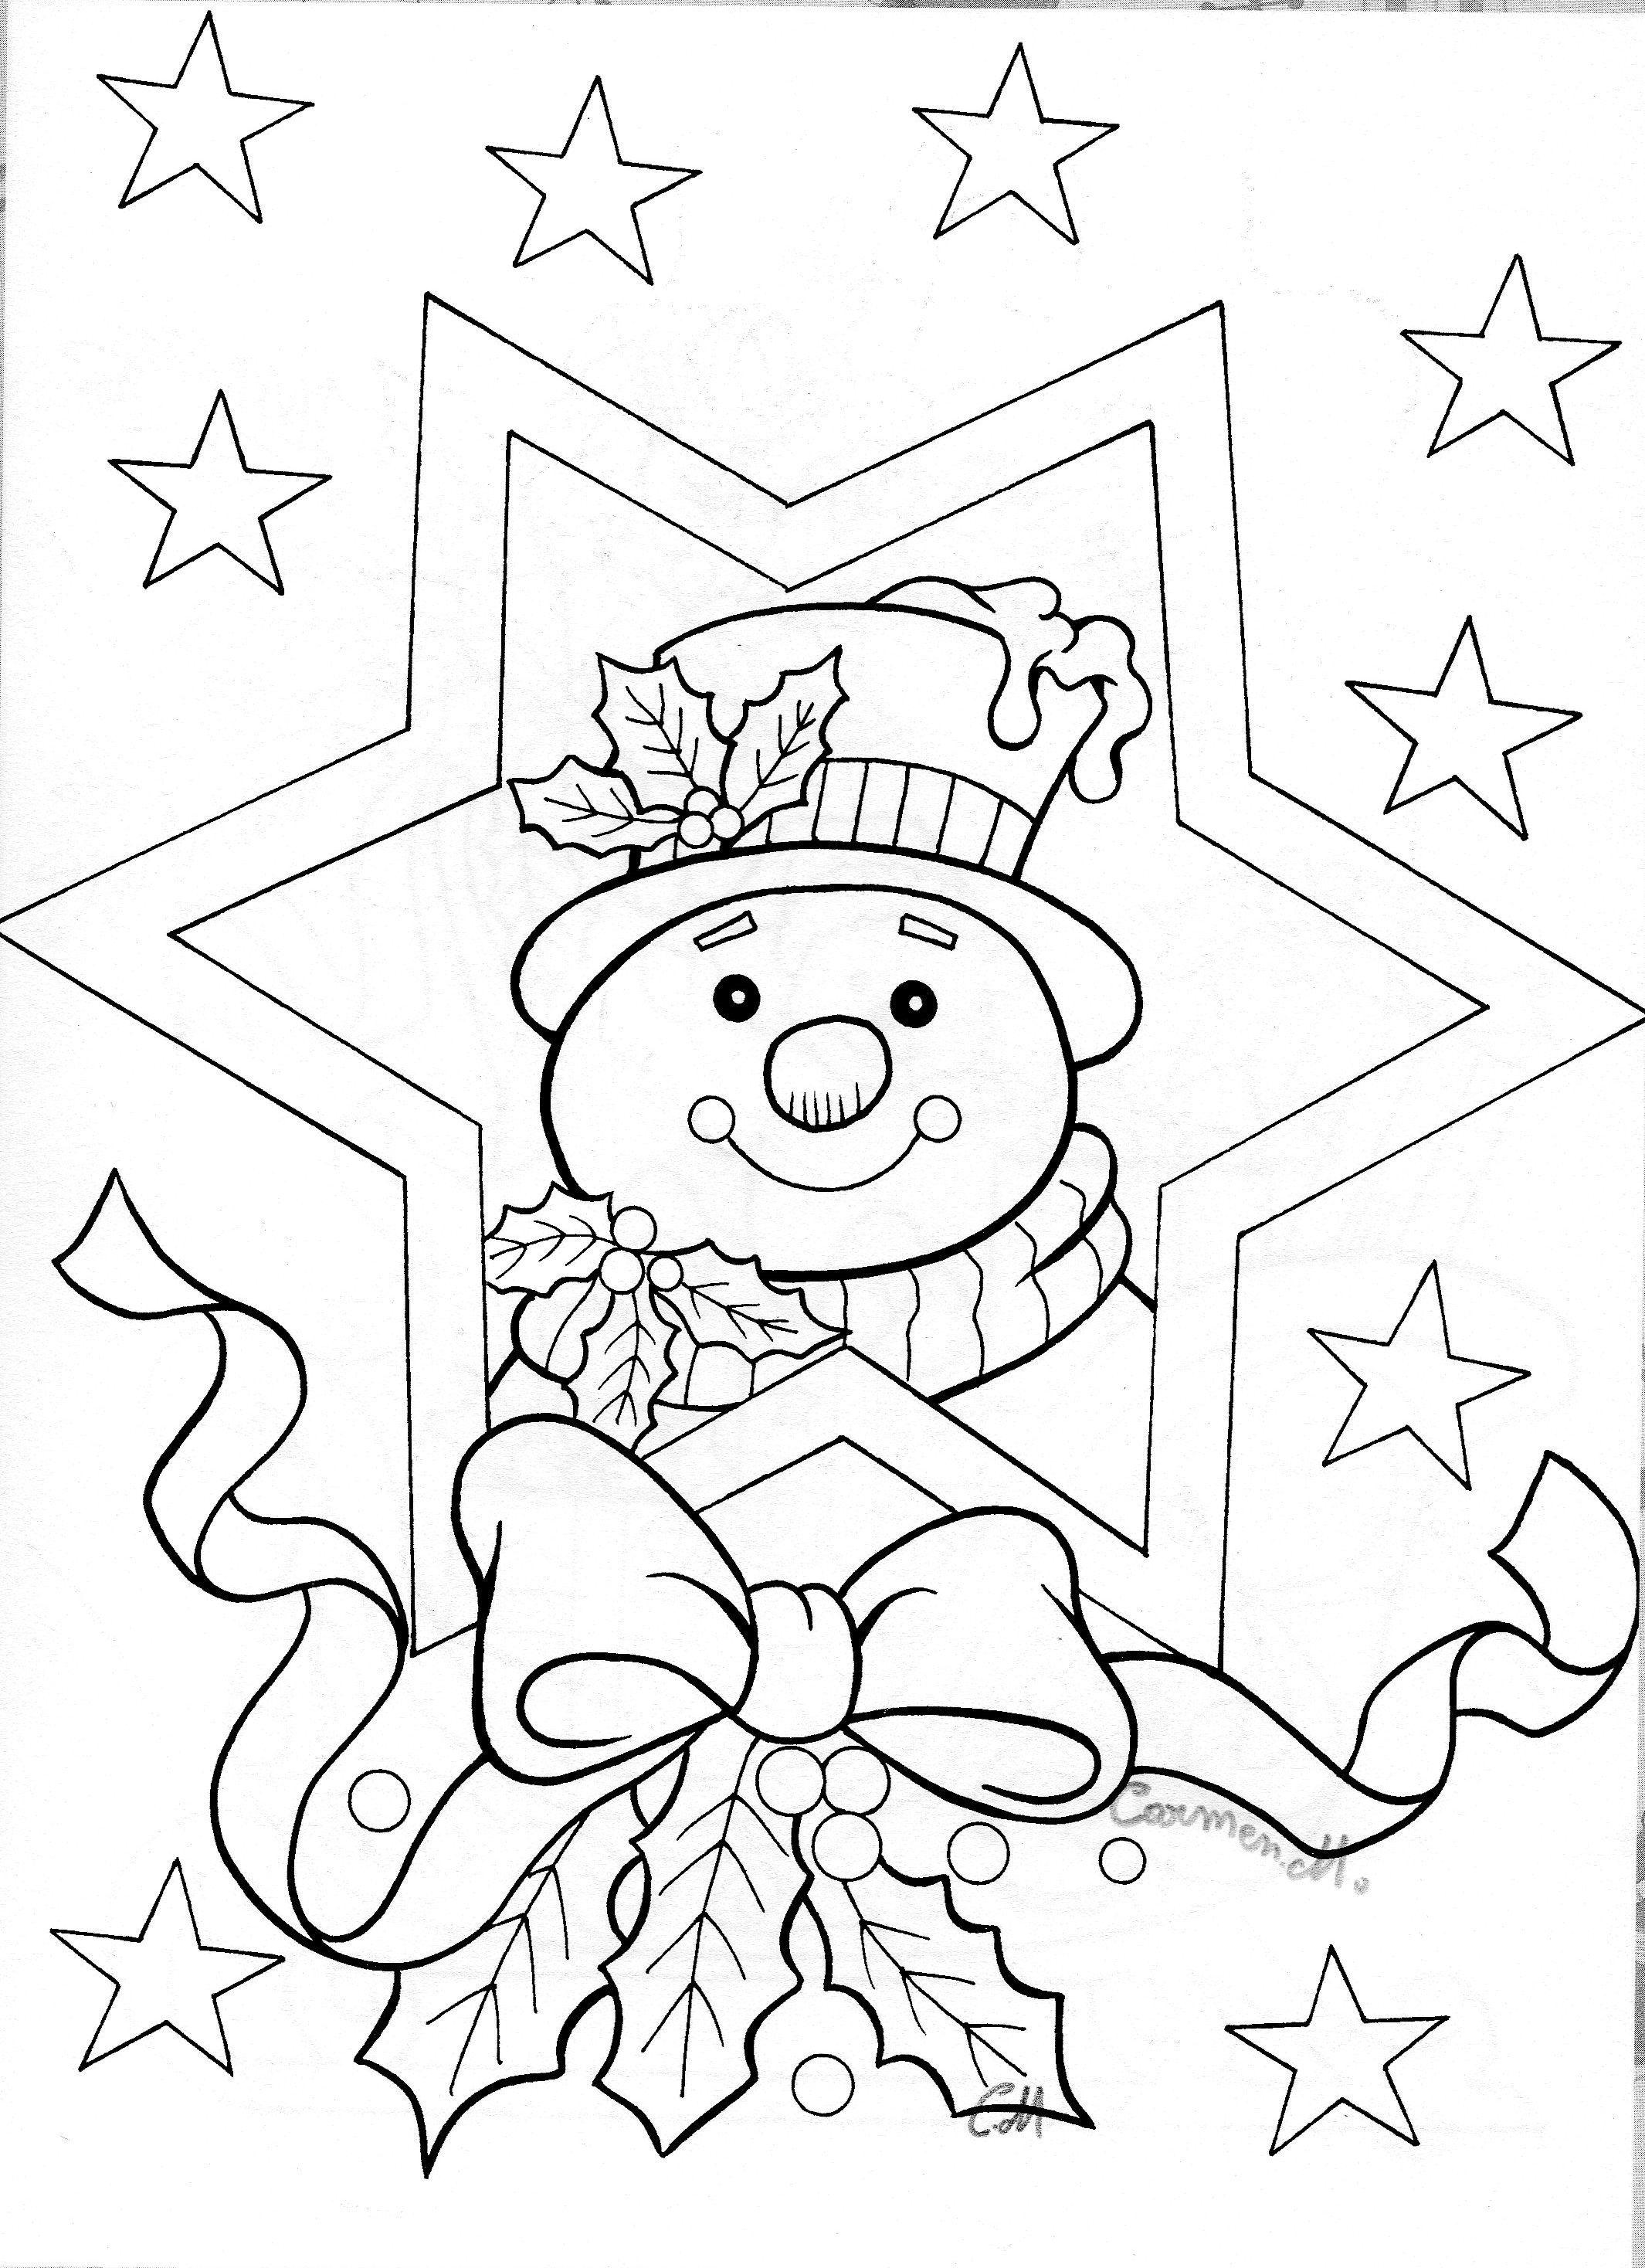 Snowman in star | Printjes kerst | Pinterest | Snowman